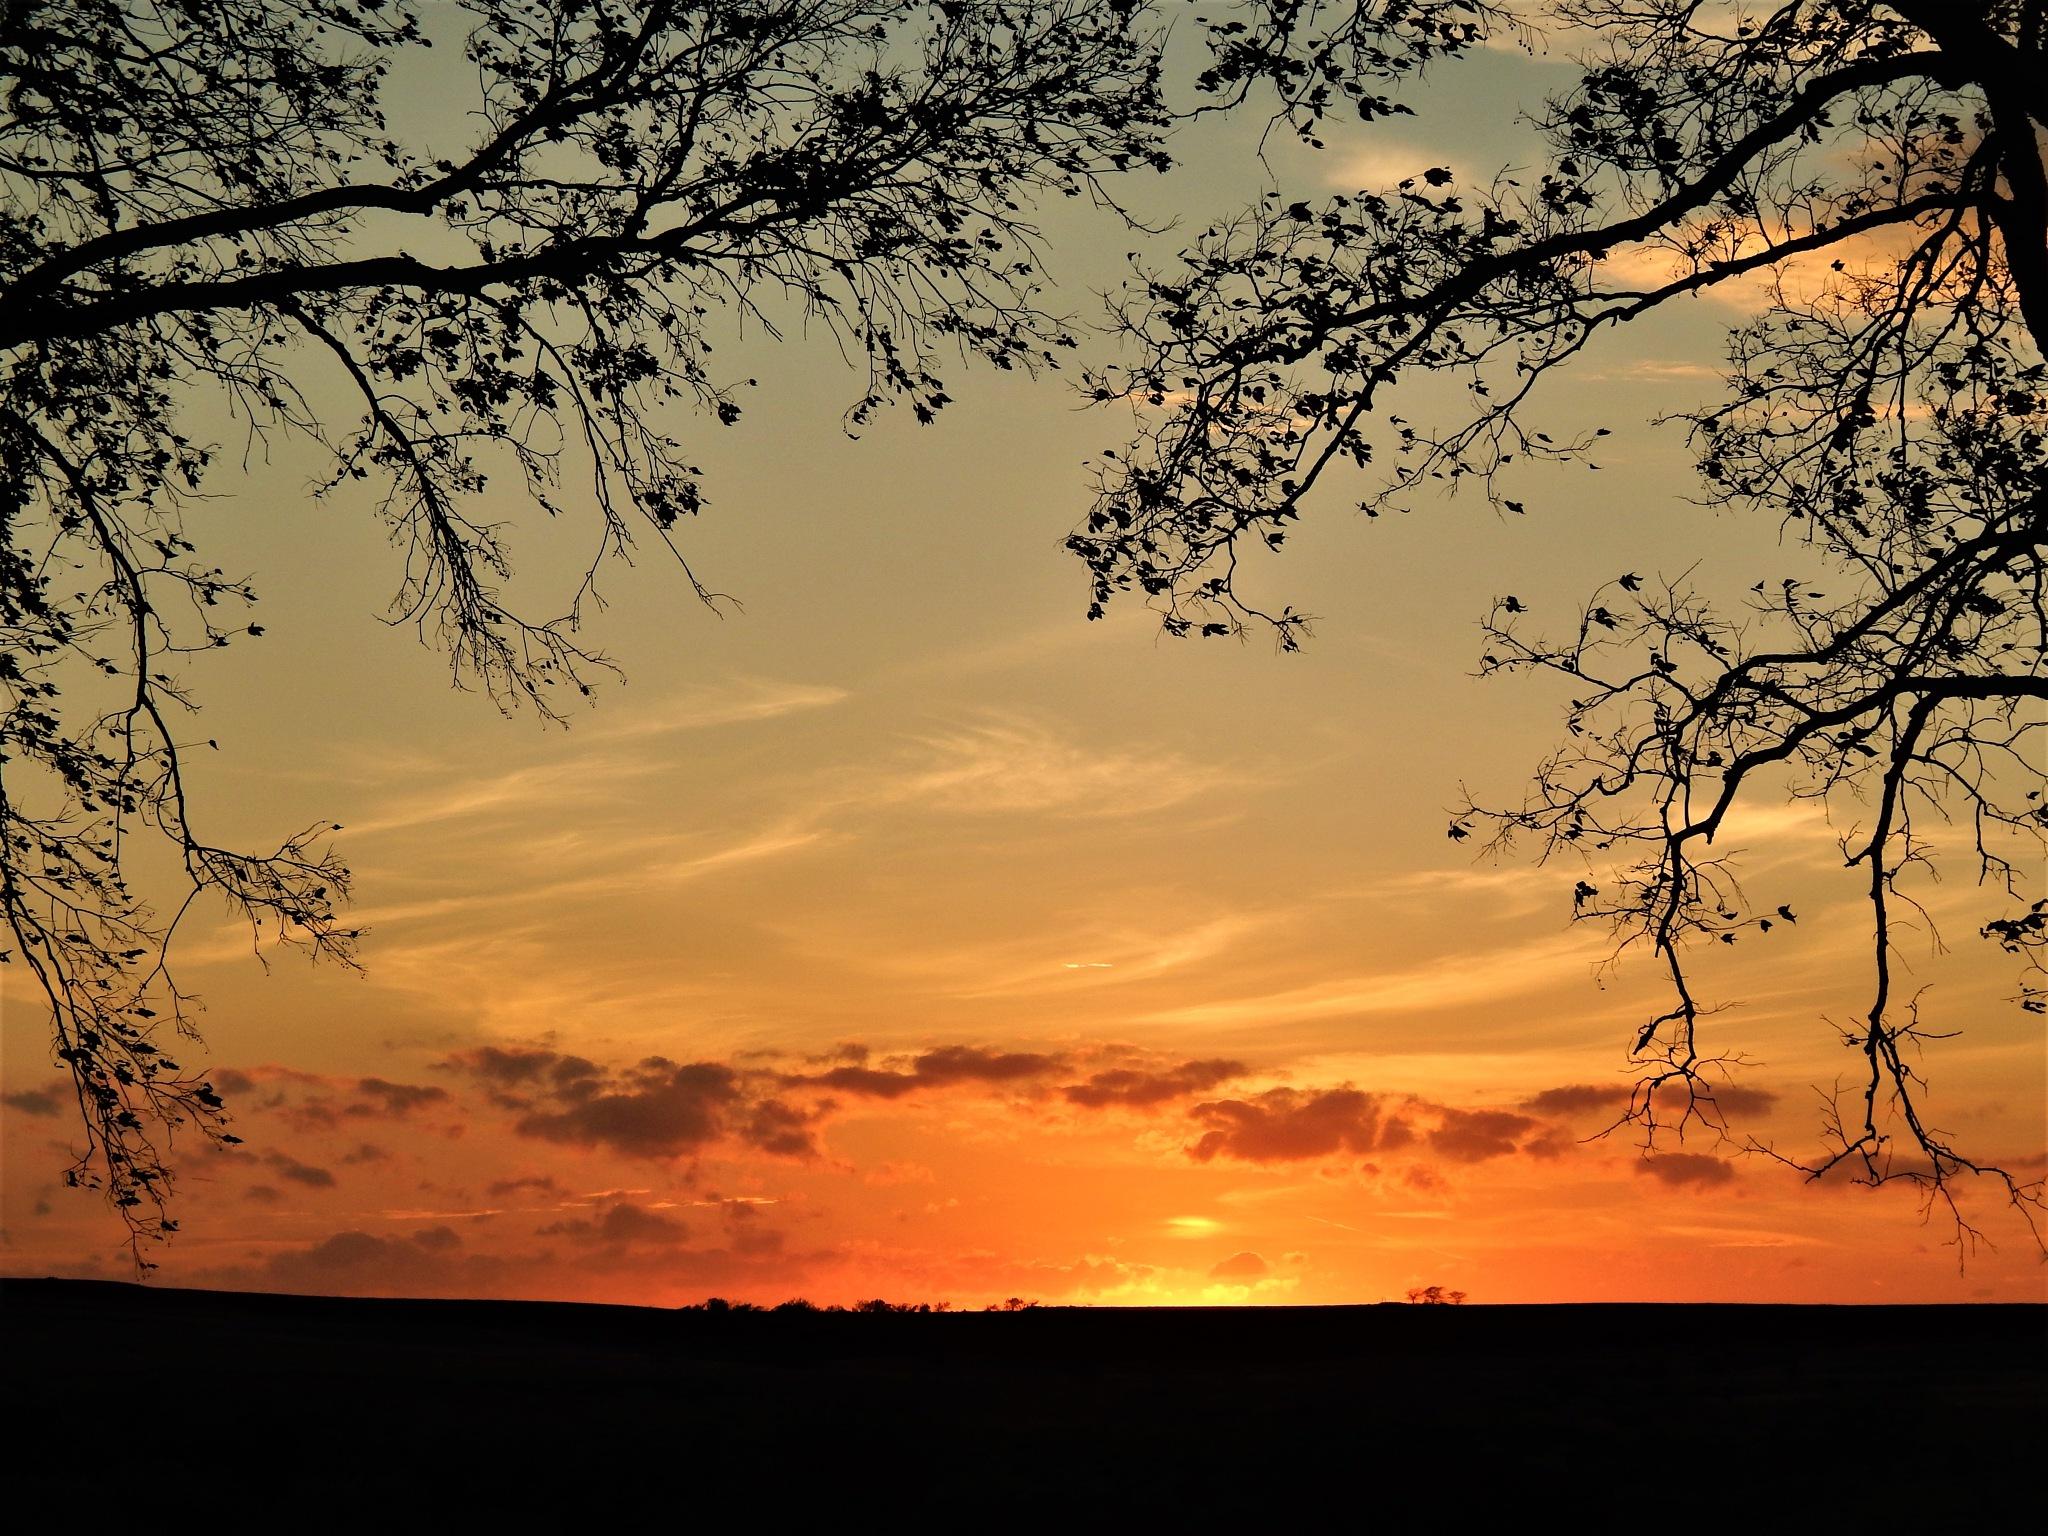 Sunset by Marsha Furman